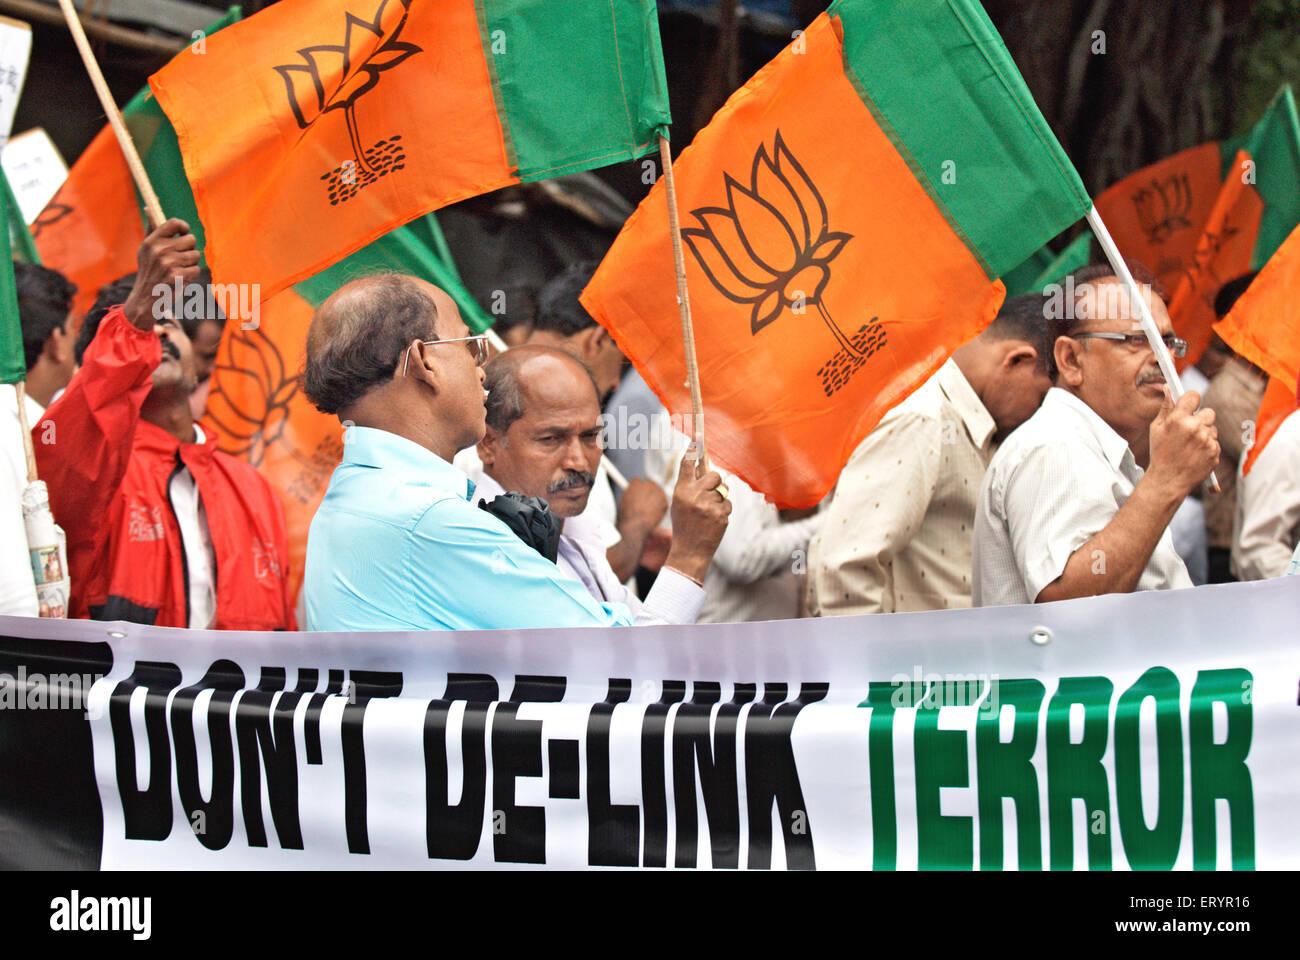 Bharatiya janata party bjp activists protesting against 26/11 terrorists attack ; Bombay Mumbai - Stock Image